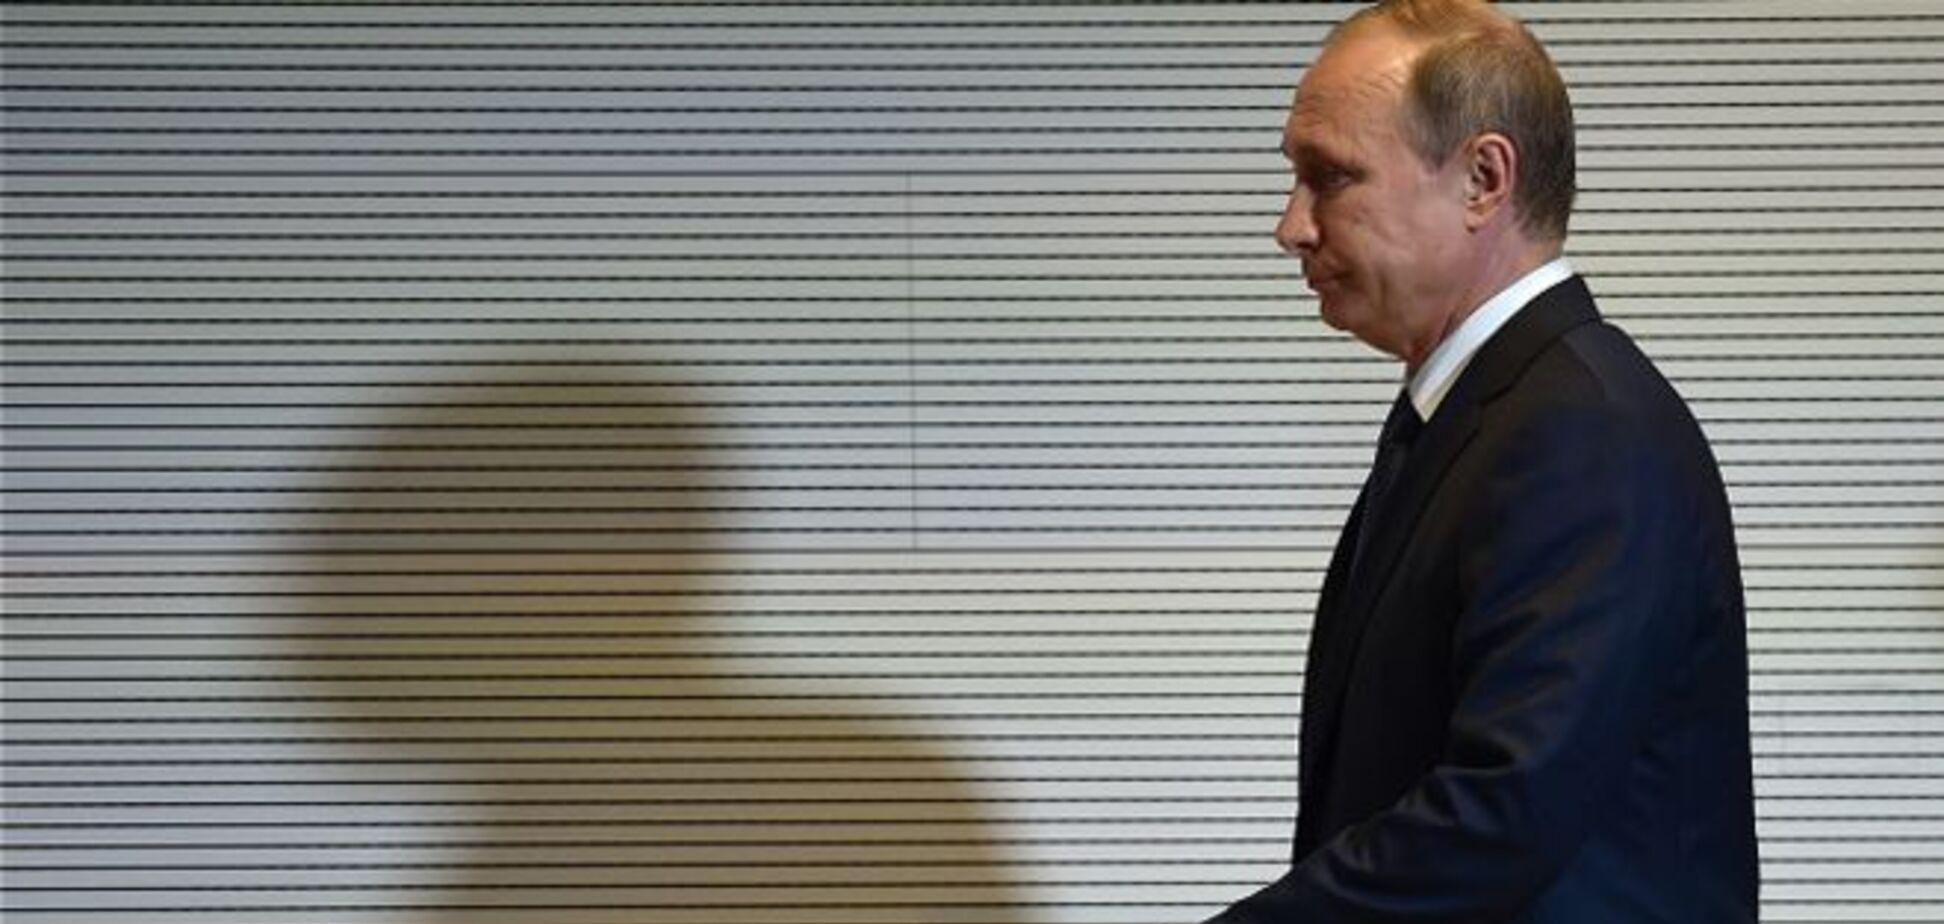 Господин Путин рубит сук, на котором сидит